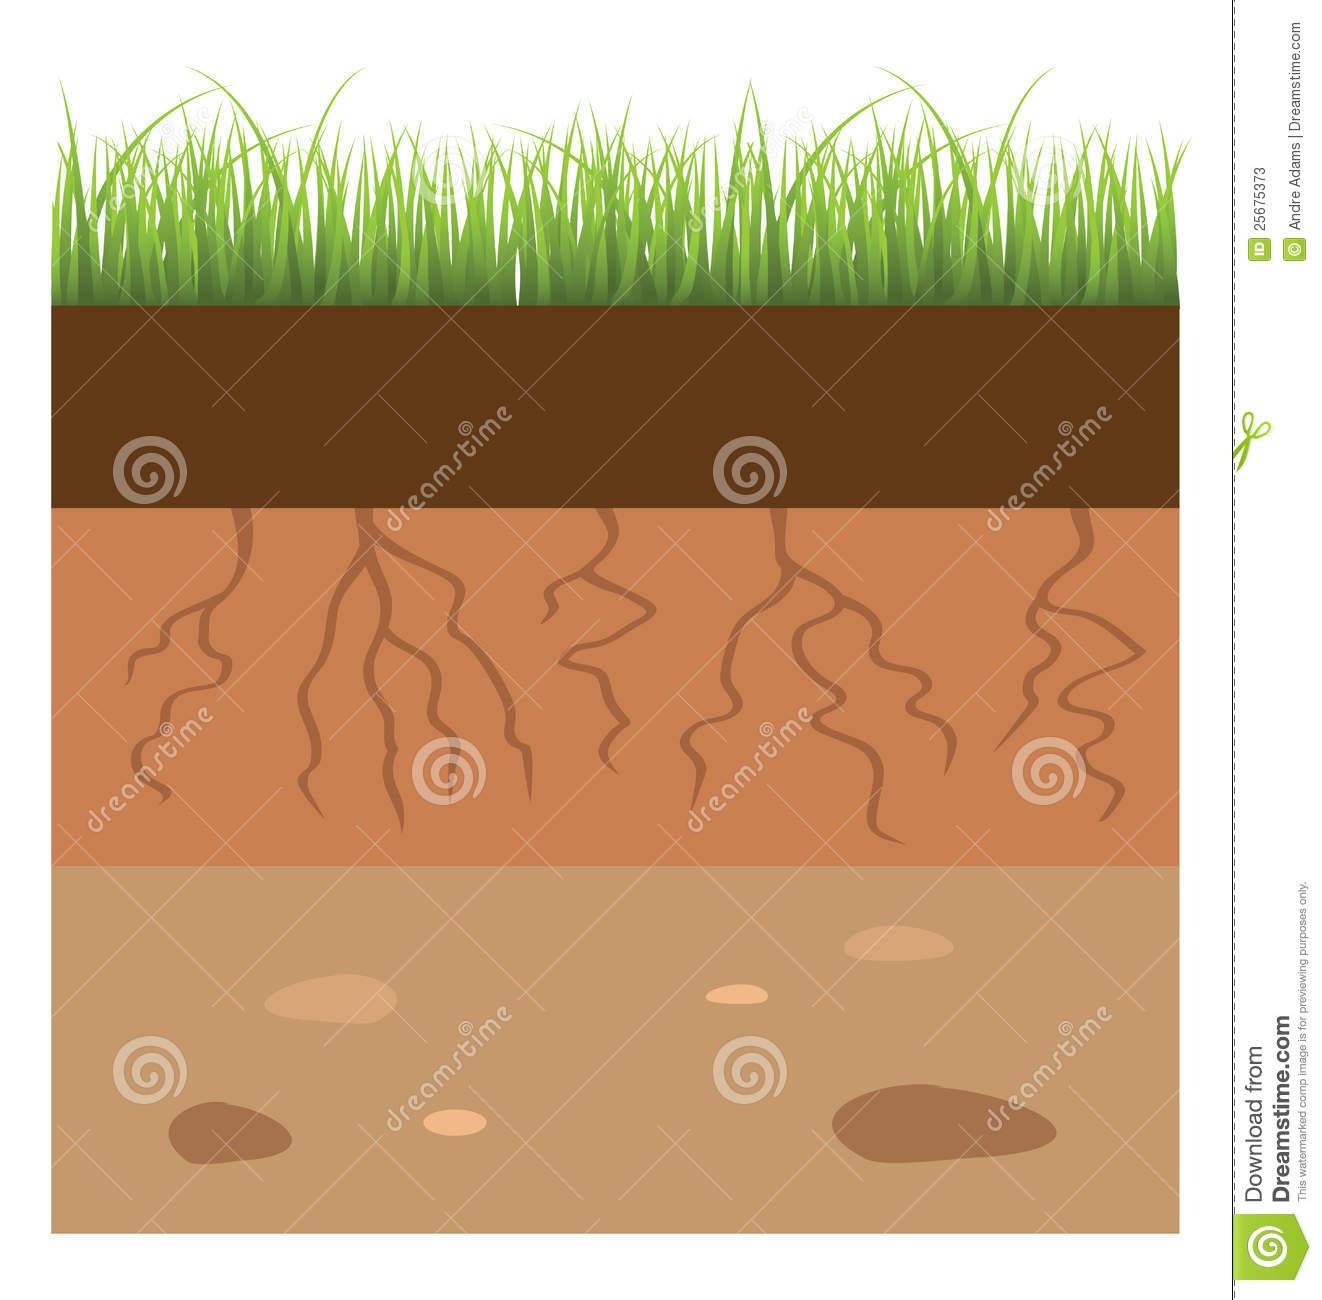 Soil Layer Clipart